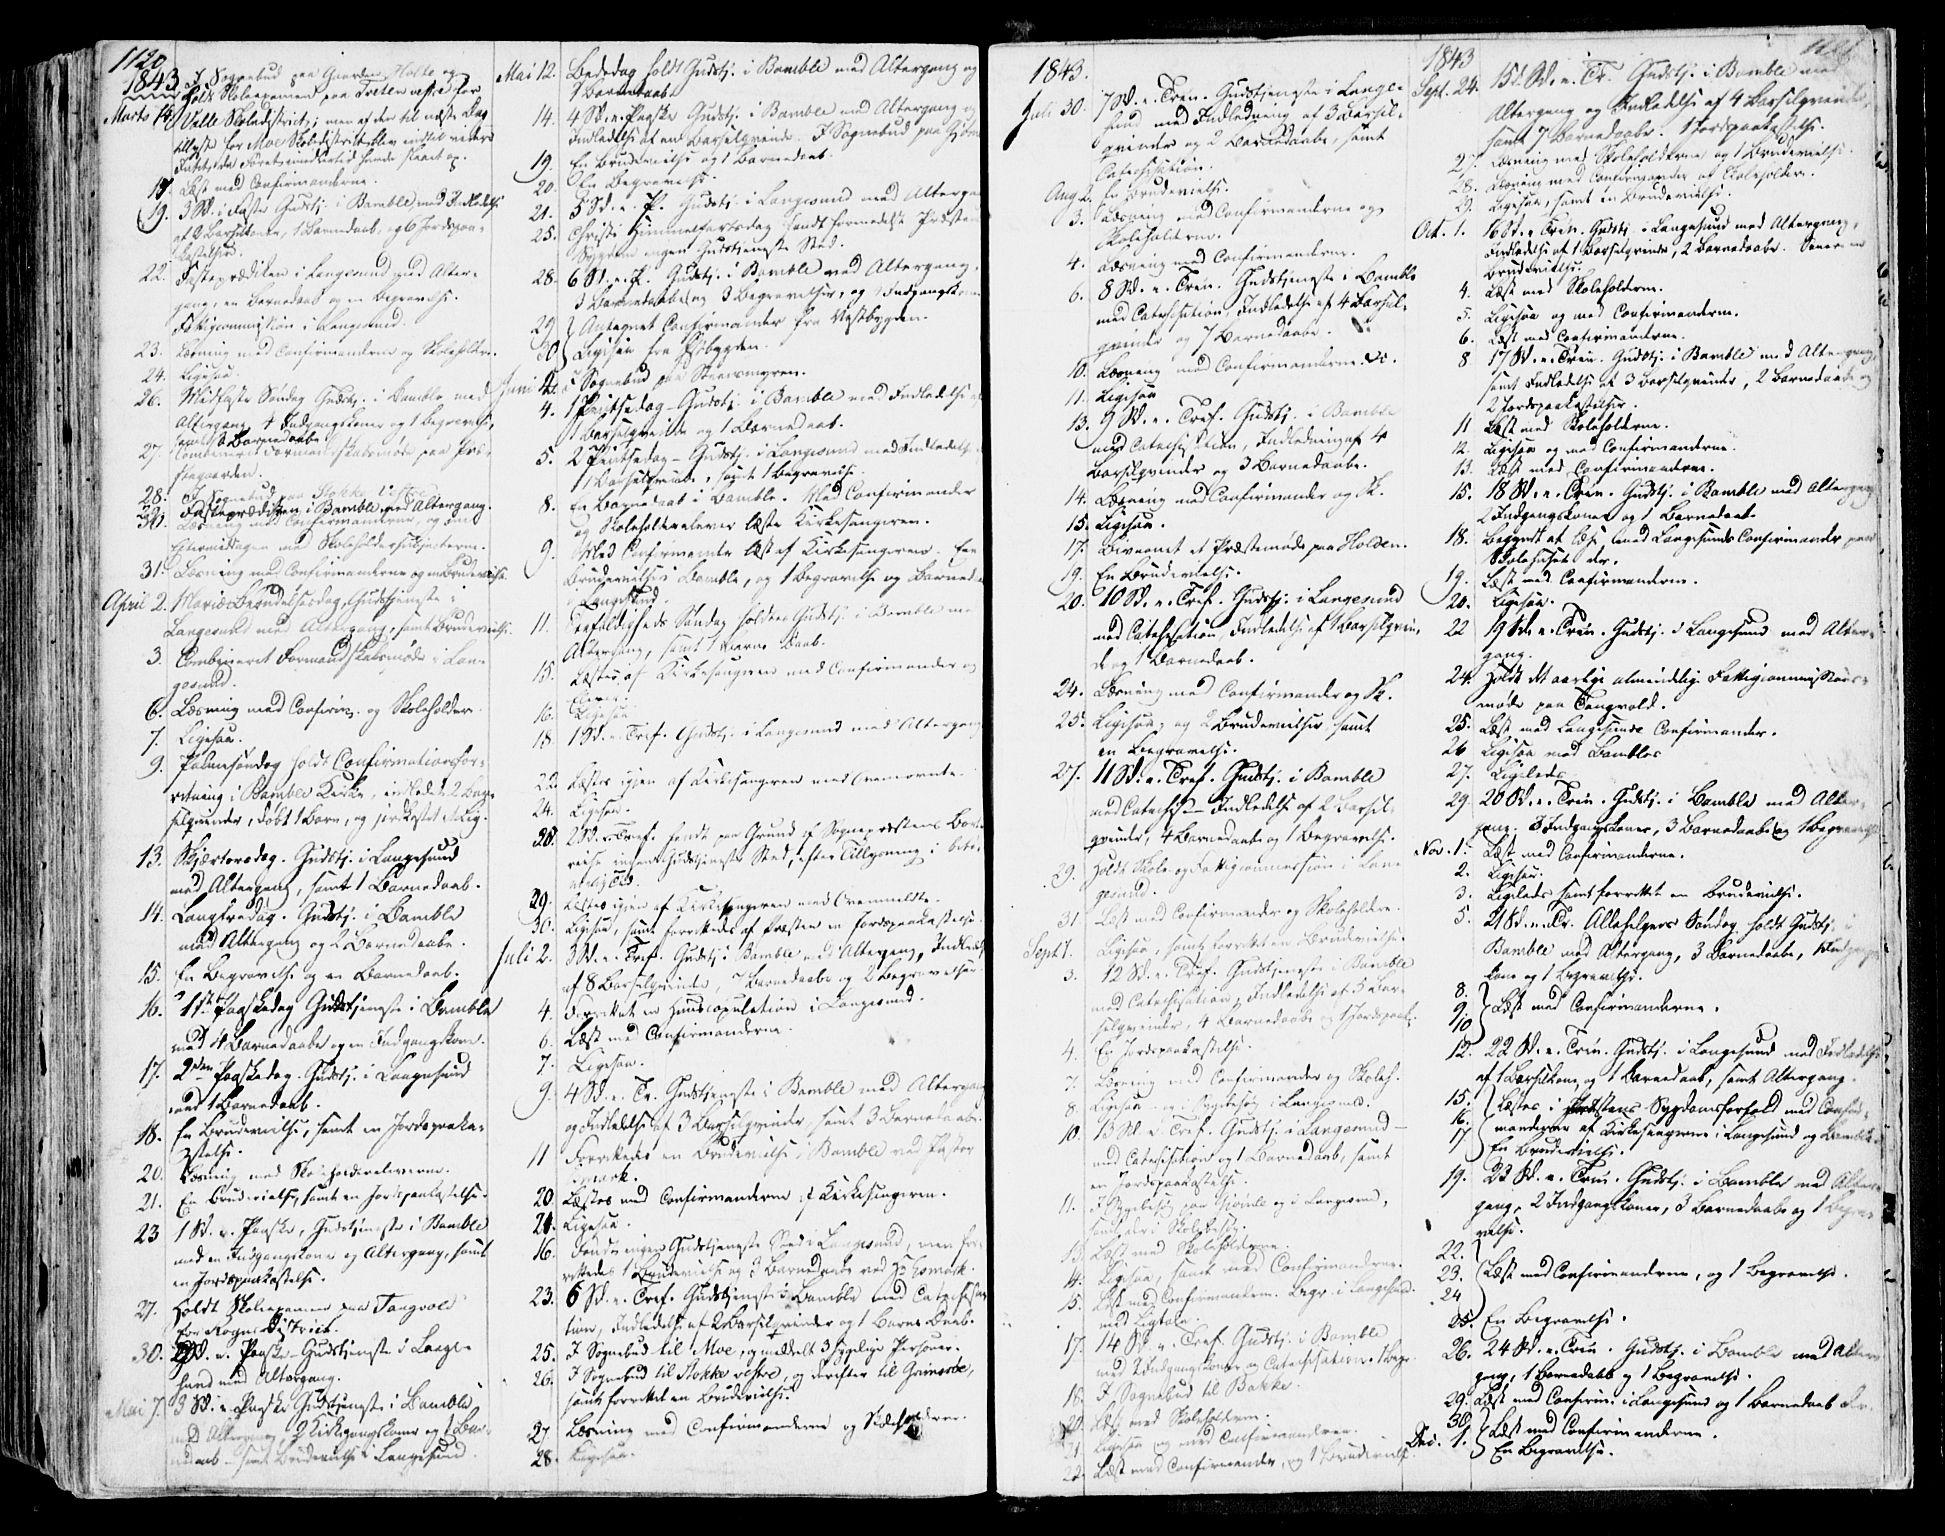 SAKO, Bamble kirkebøker, F/Fa/L0004: Ministerialbok nr. I 4, 1834-1853, s. 1120-1121